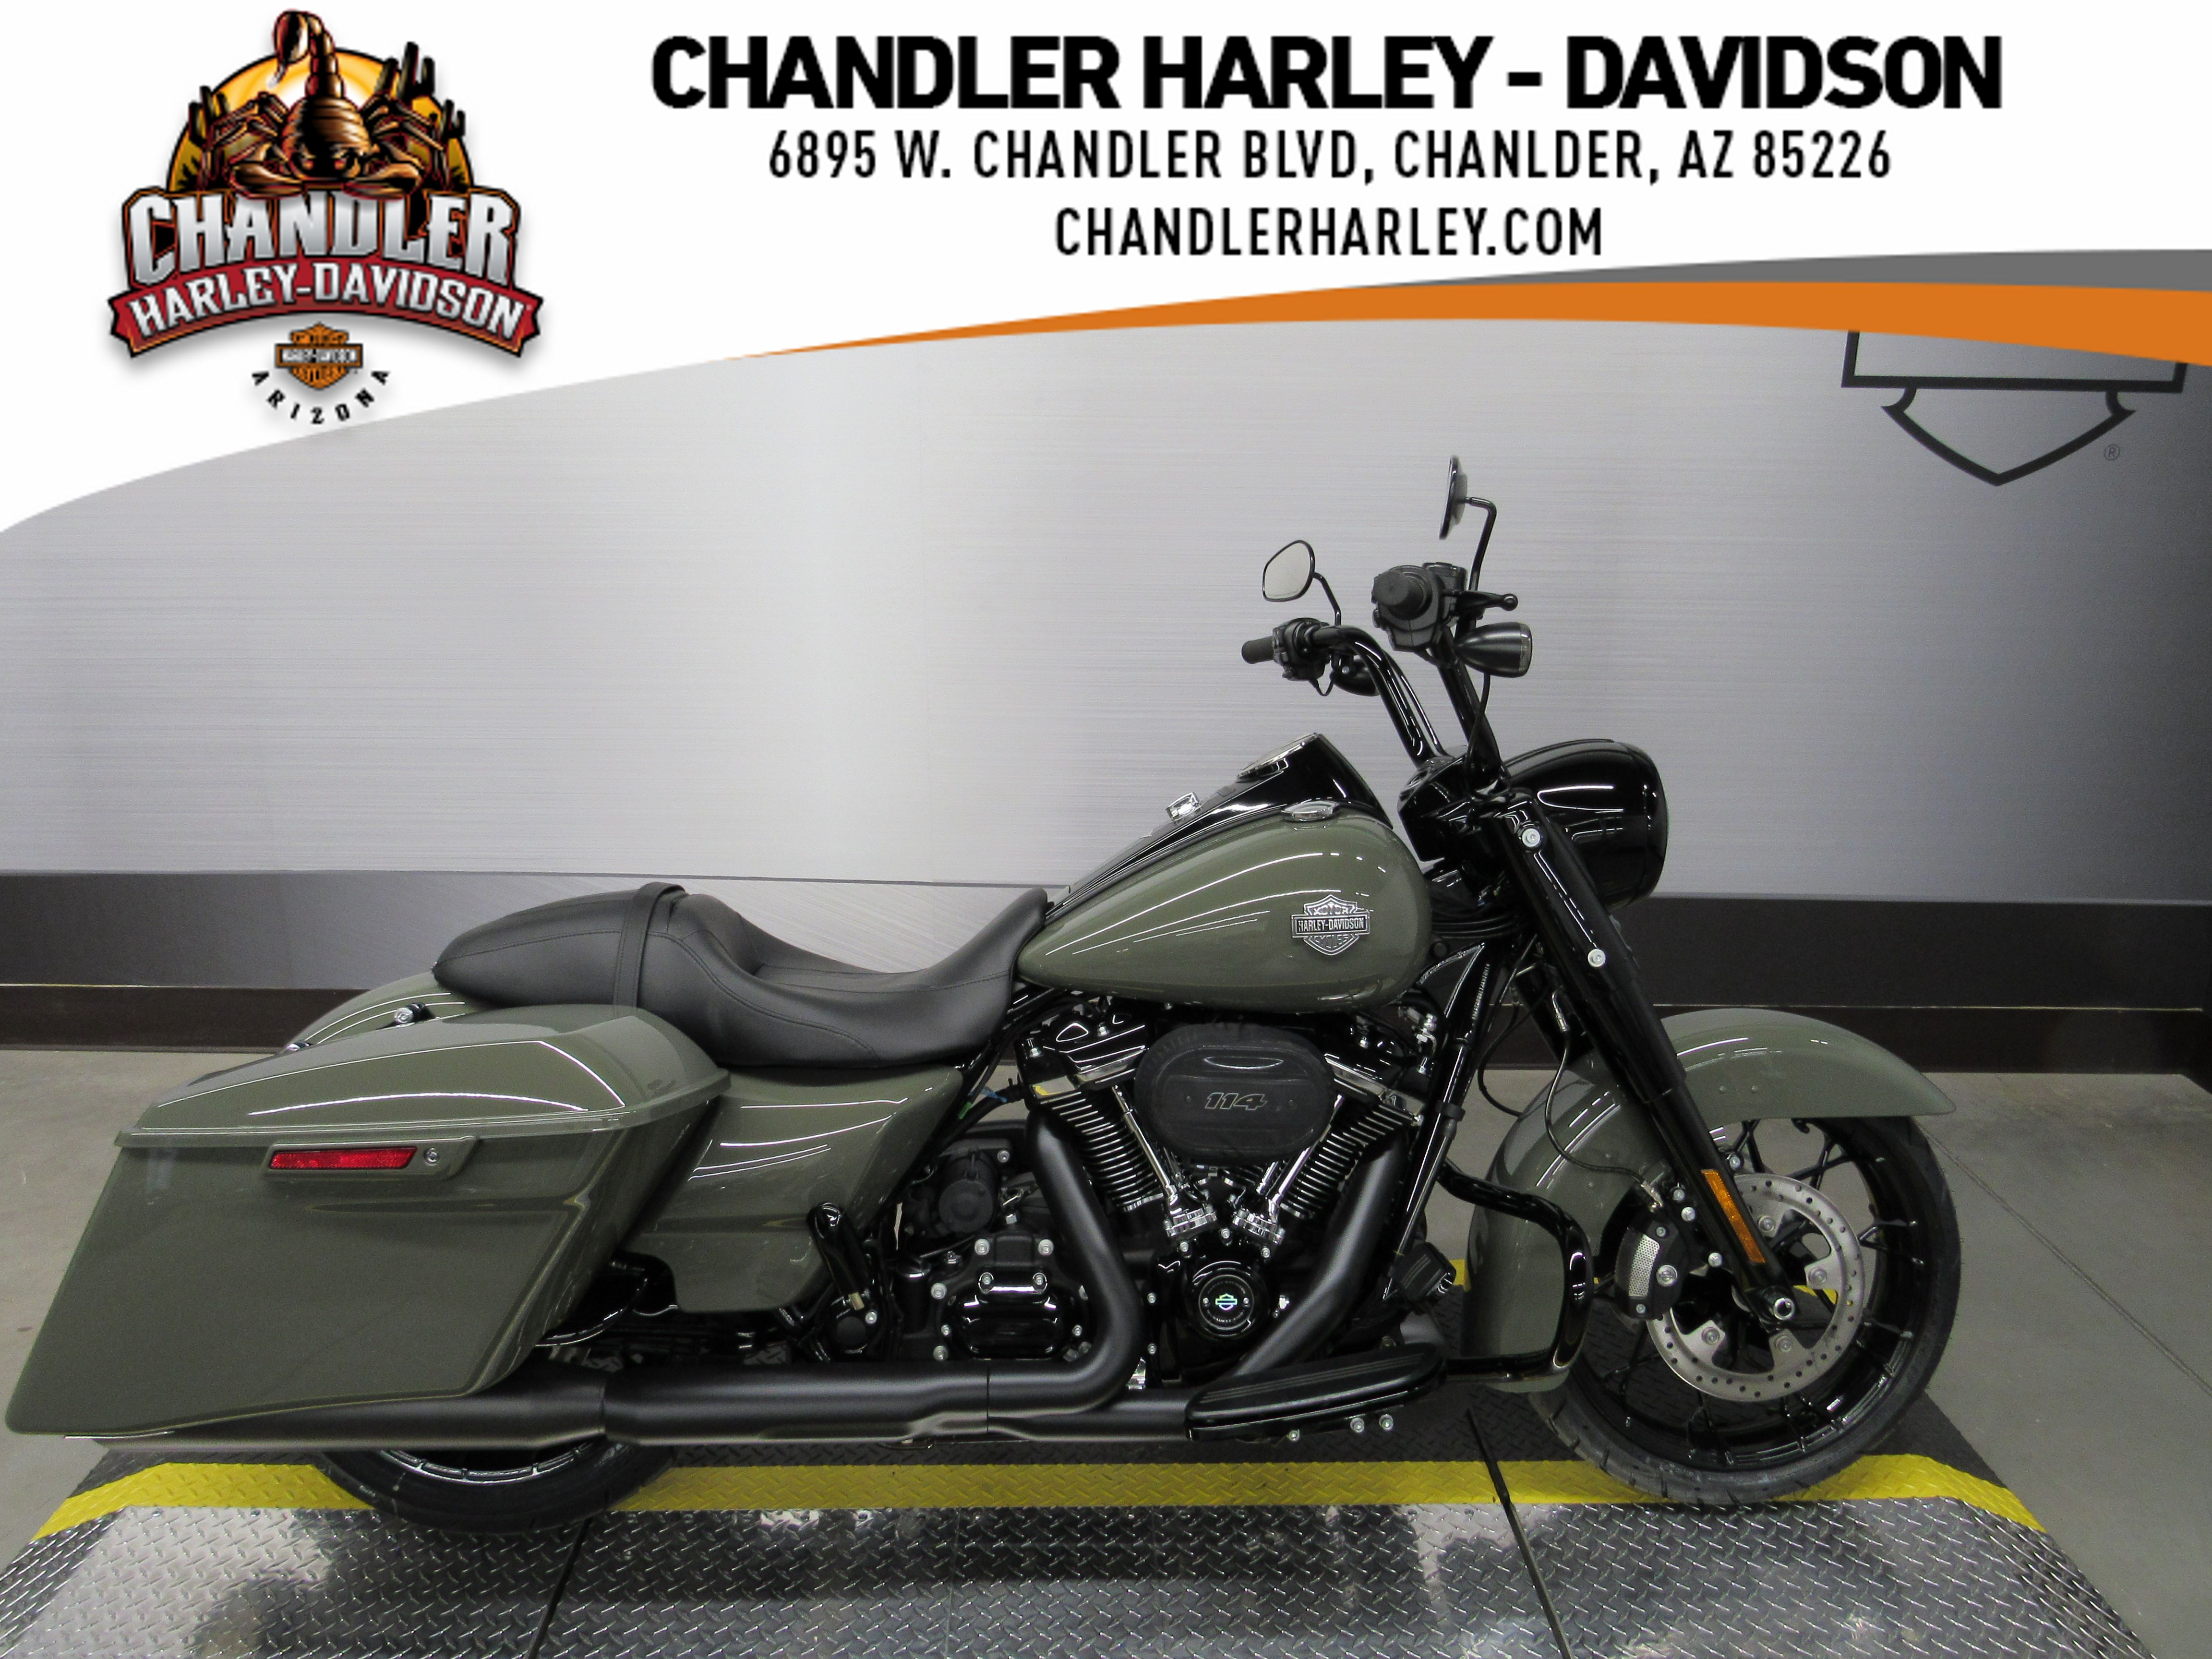 2021 Harley-Davidson Road King Special